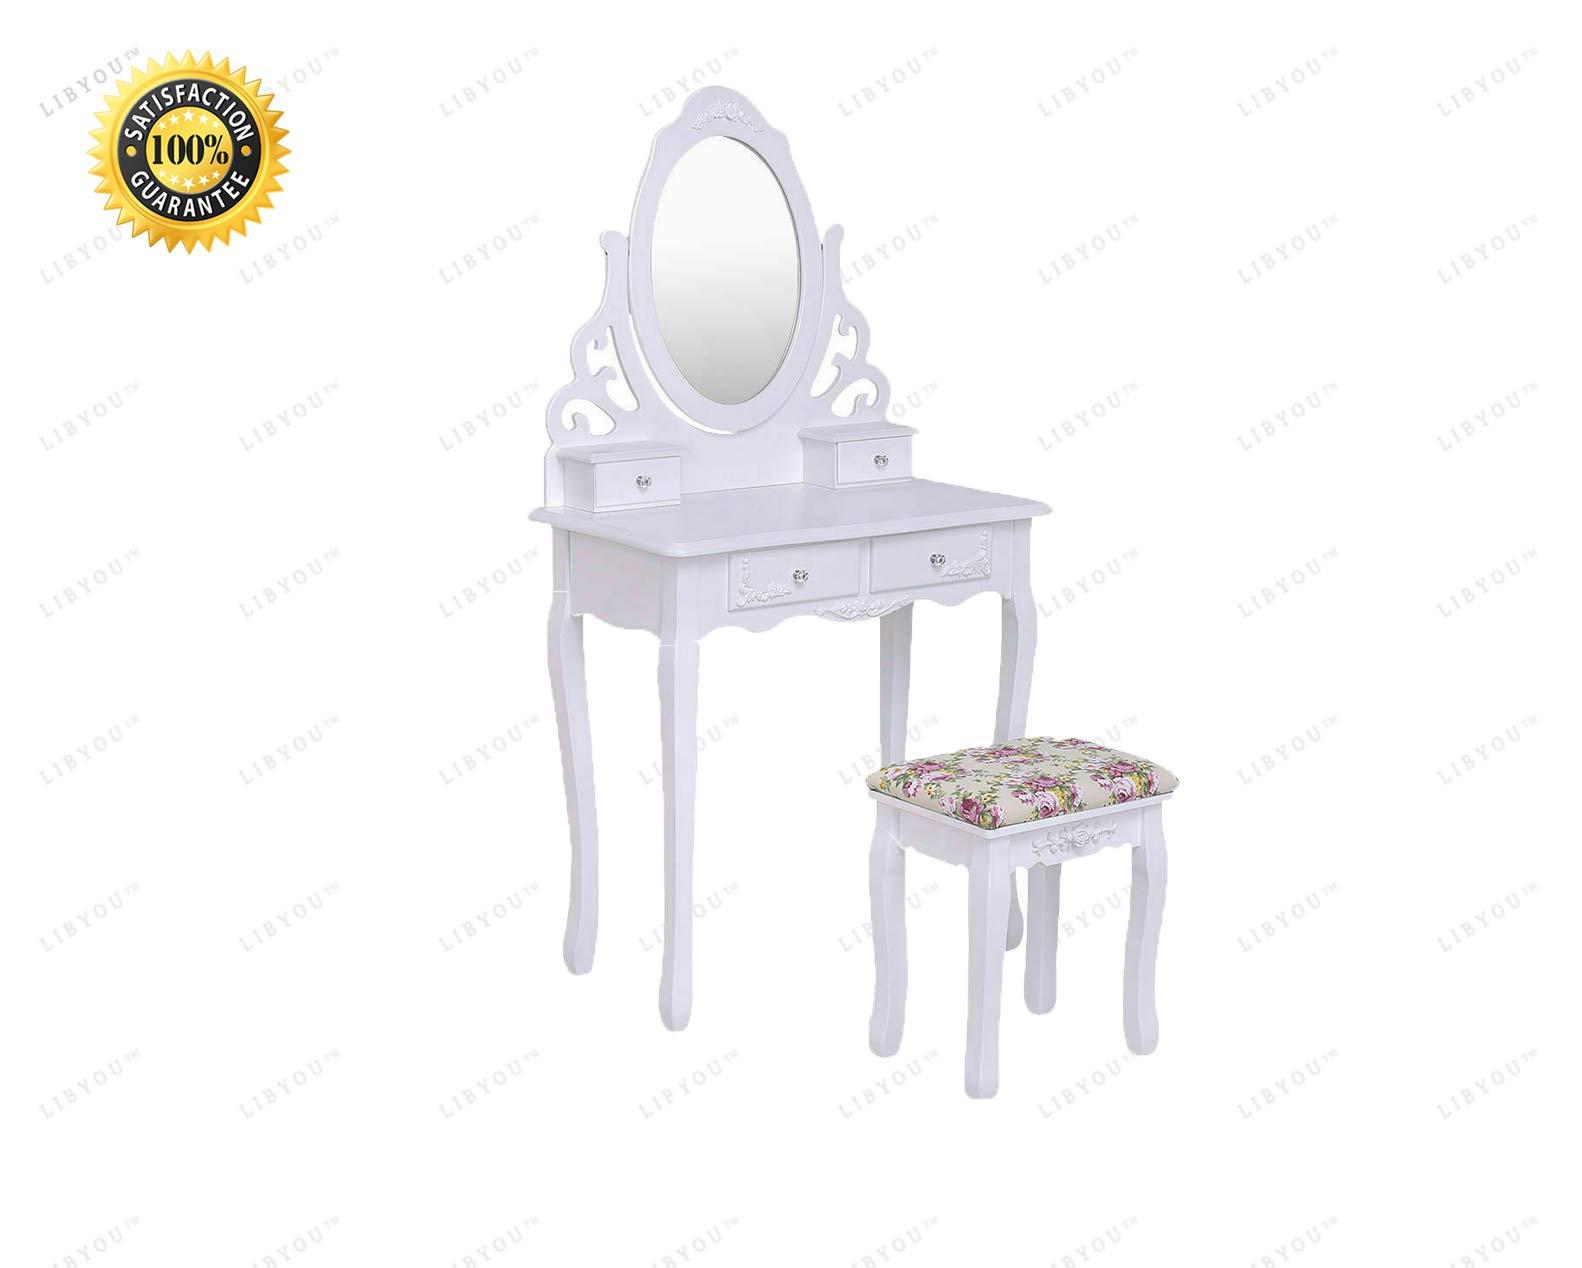 LIBYOU__Dressing Table Set,Vanity Wood Makeup Table,Vanity Wood Makeup,Mirrored Dressing Table,Vanity Table Set,Dressing Table,Mirror Makeup Table,Wood Makeup Dressing Table